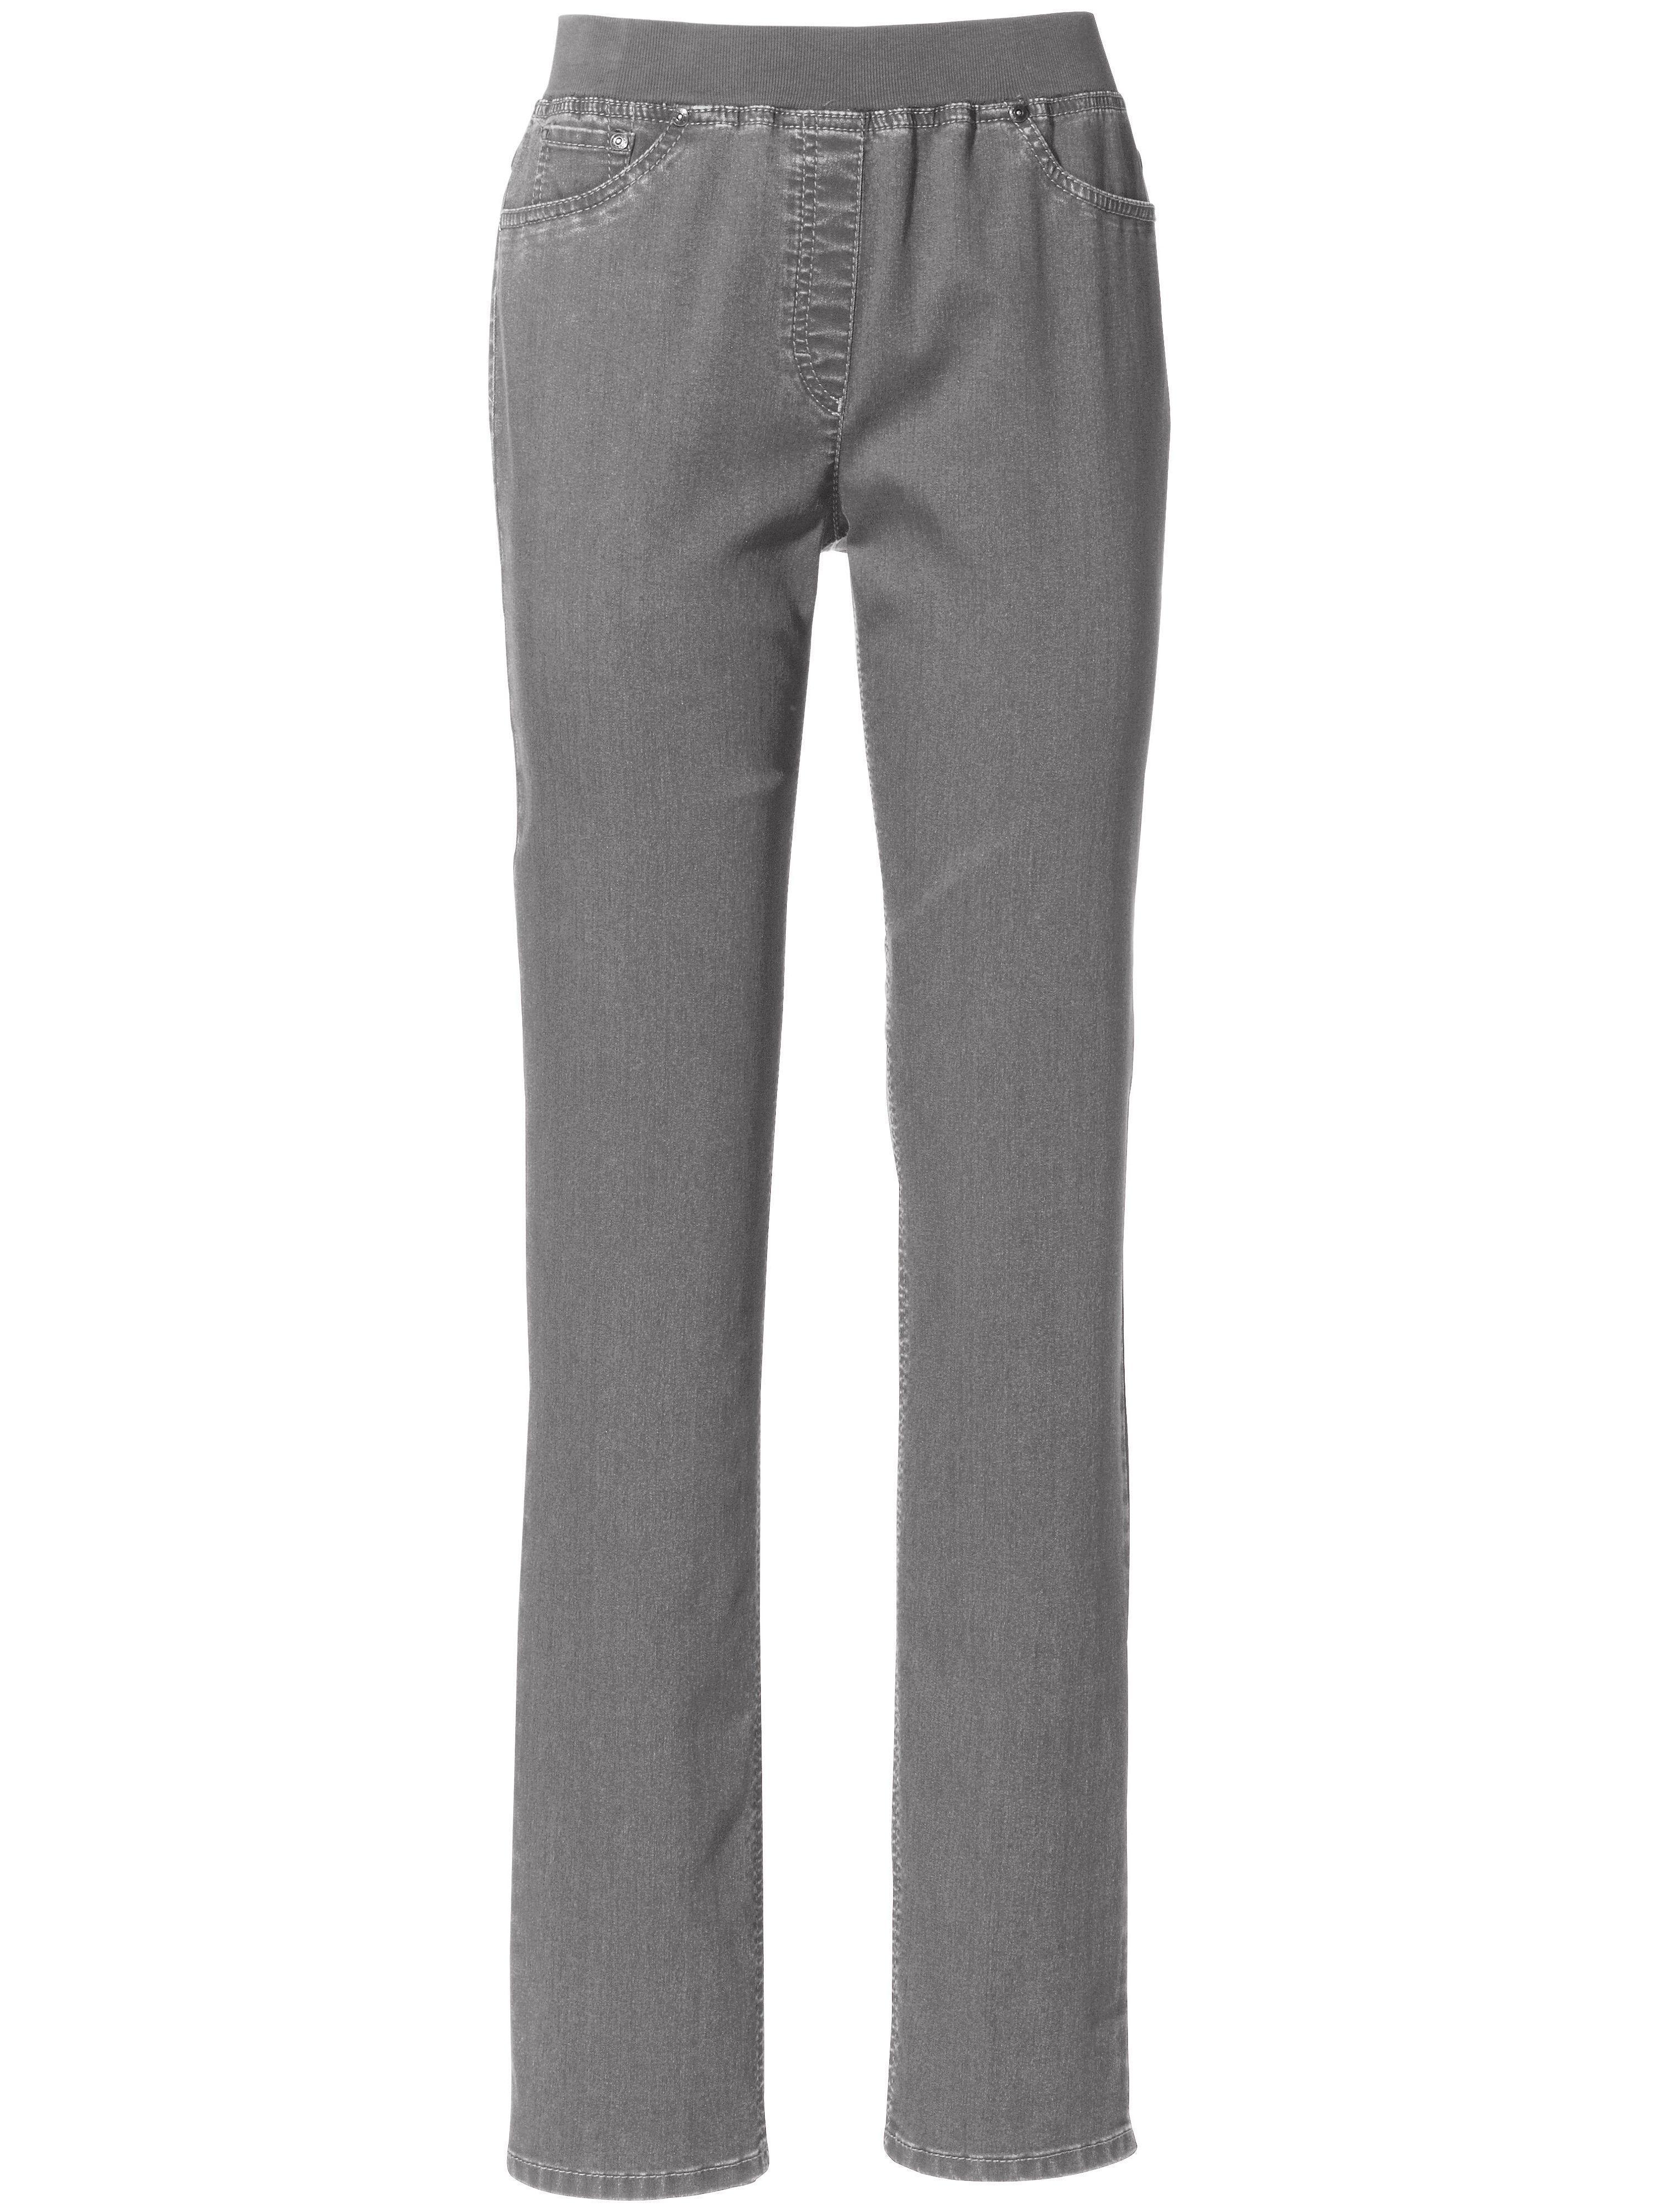 Image of   'ProForm Slim'-jeans, Raphaela by Brax, Pamina Fra Raphaela by Brax grå